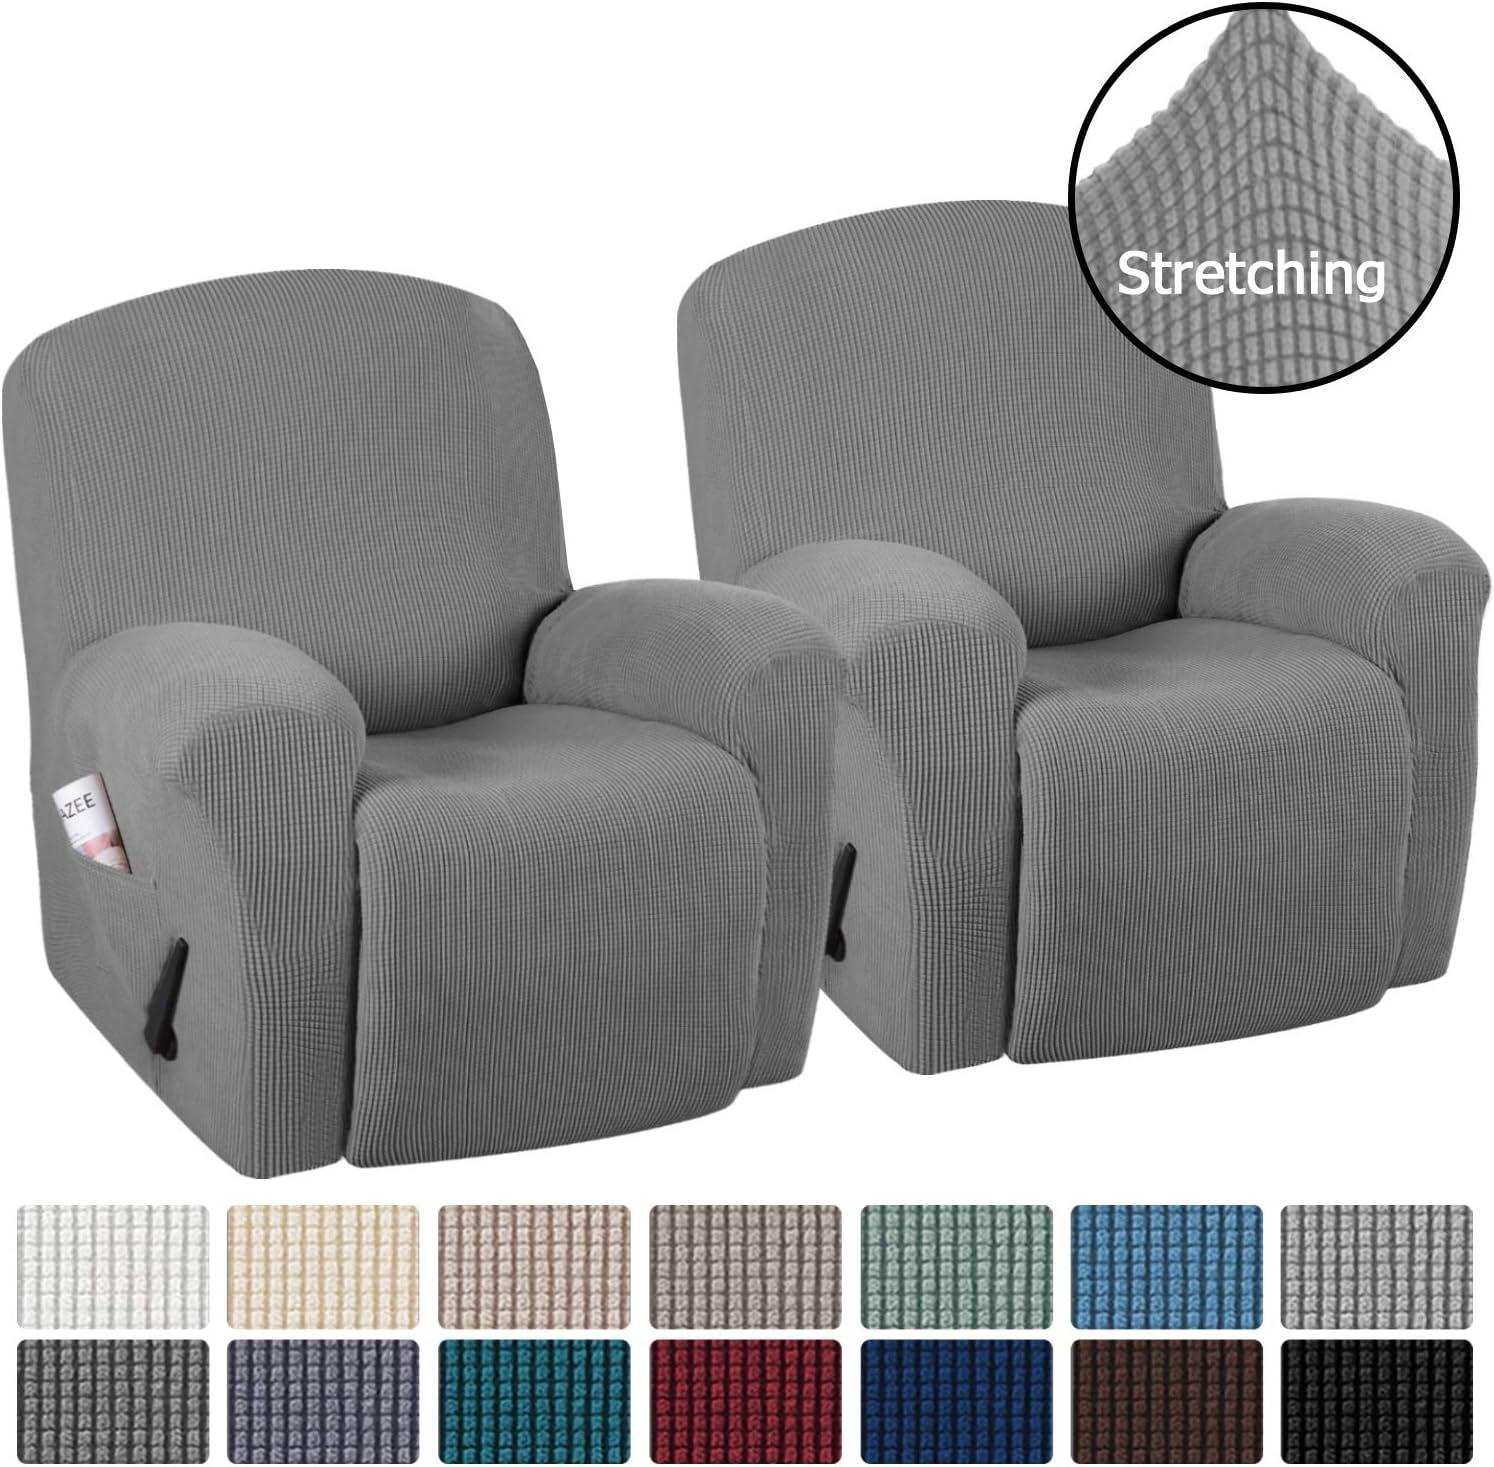 H.VERSAILTEX Stretch Recliner Slipcovers Durable Soft High Stretch Jacquard Sofa Furniture Cover Form Fit Stretch Stylish Recliner Cover//Protector 2 Pack Recliner, Burgundy Red